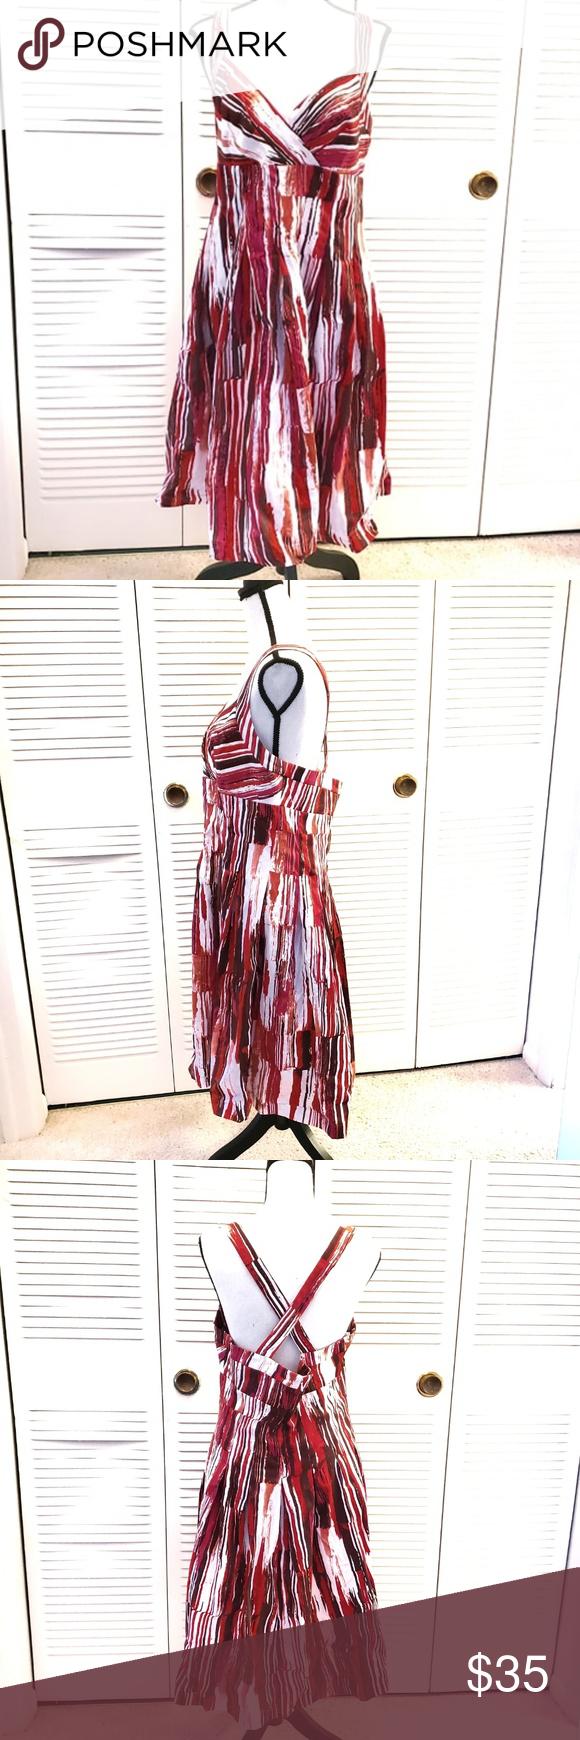 Calvin Klein Size 14 Cotton Summer Dress Size 14 Calvin Klein Cotton Mix Summer Dress Size 14 White Red And P Cotton Dress Summer Summer Dresses Summer Cotton [ 1740 x 580 Pixel ]